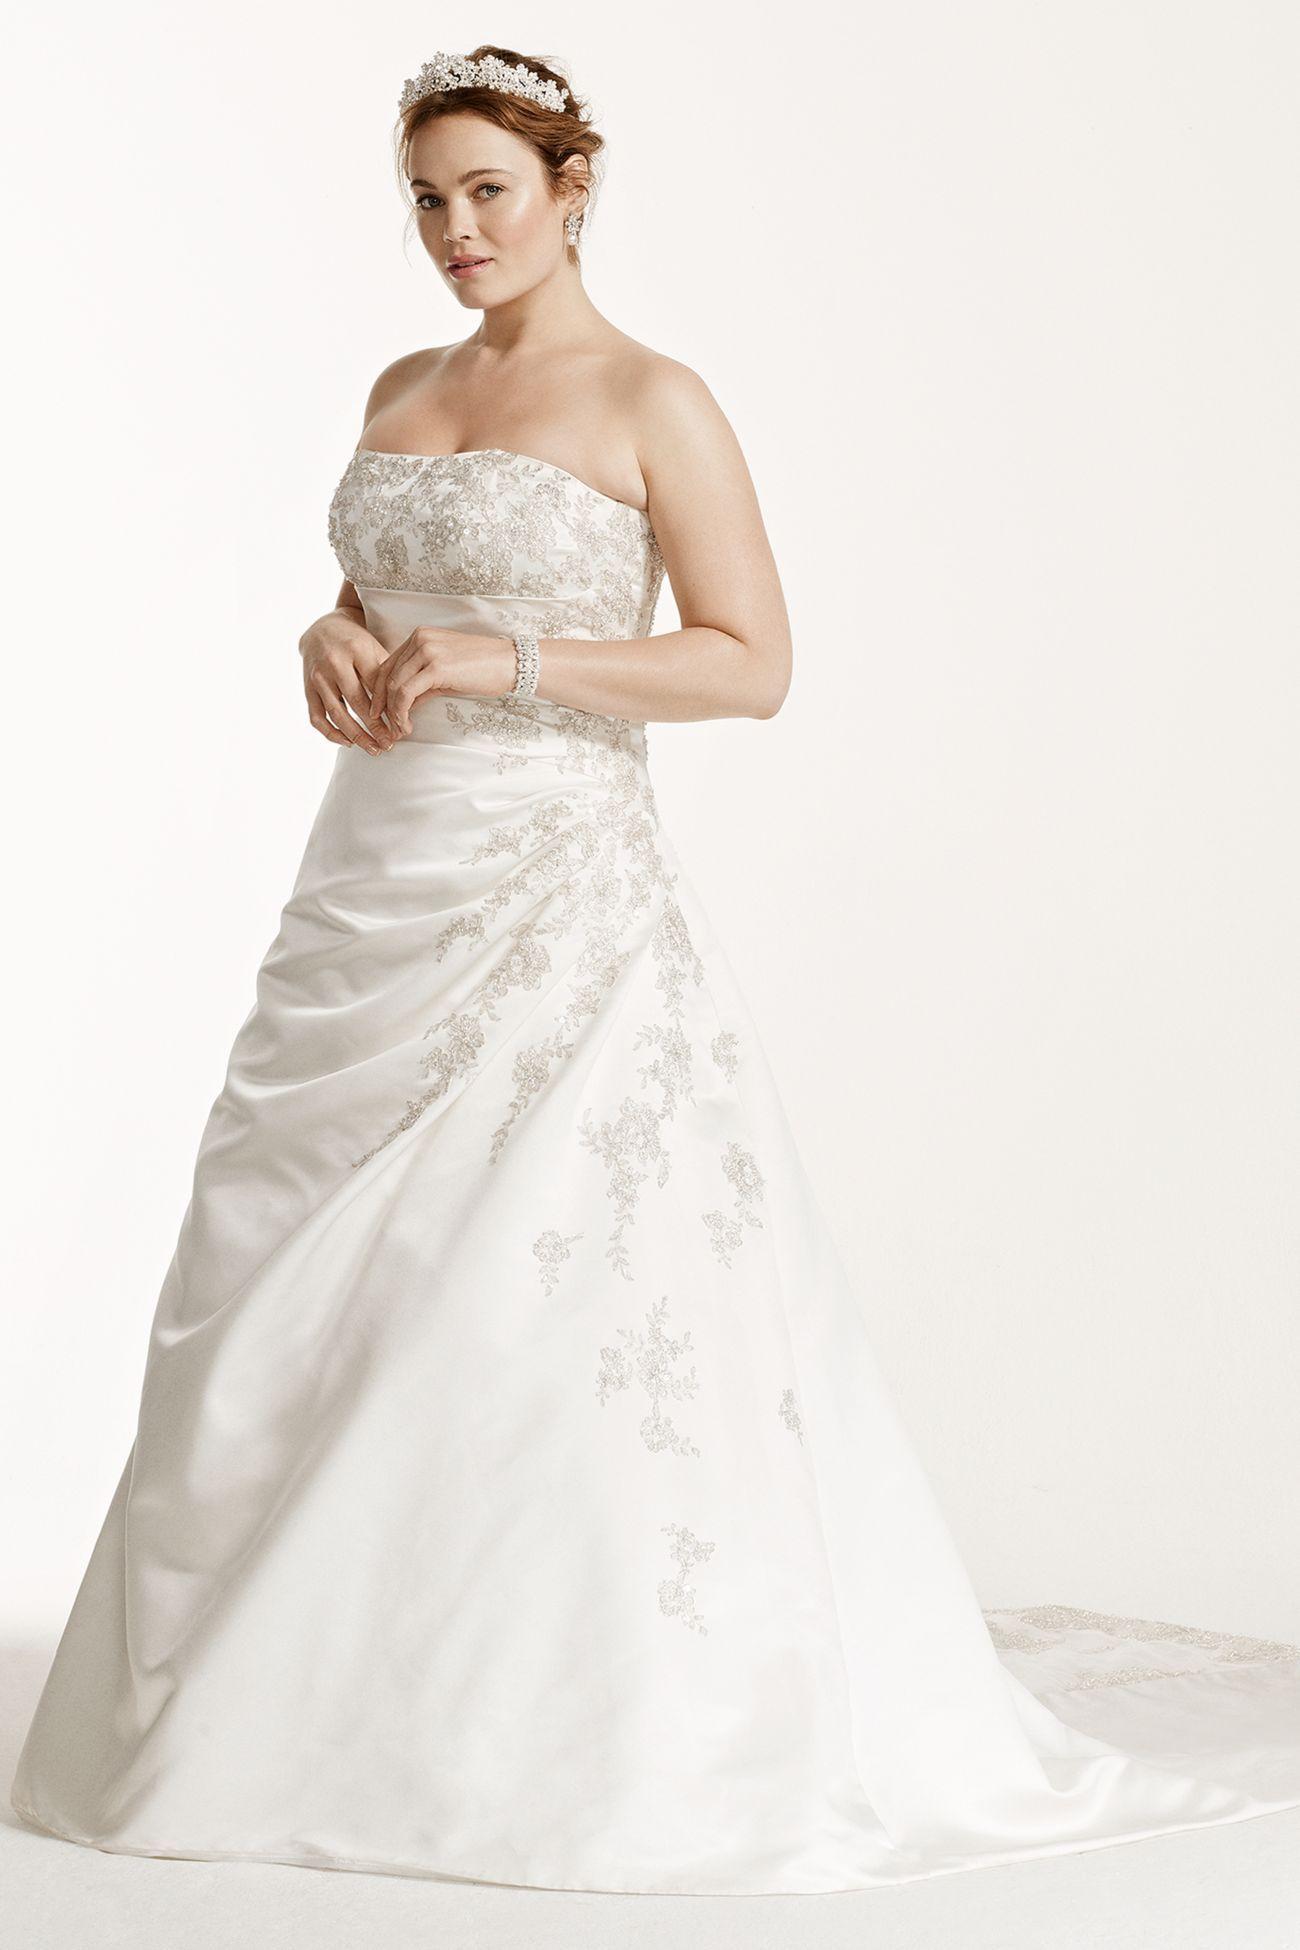 Maternity wedding dresses david's bridal  V  wedding dress  Pinterest  Wedding dress Wedding and